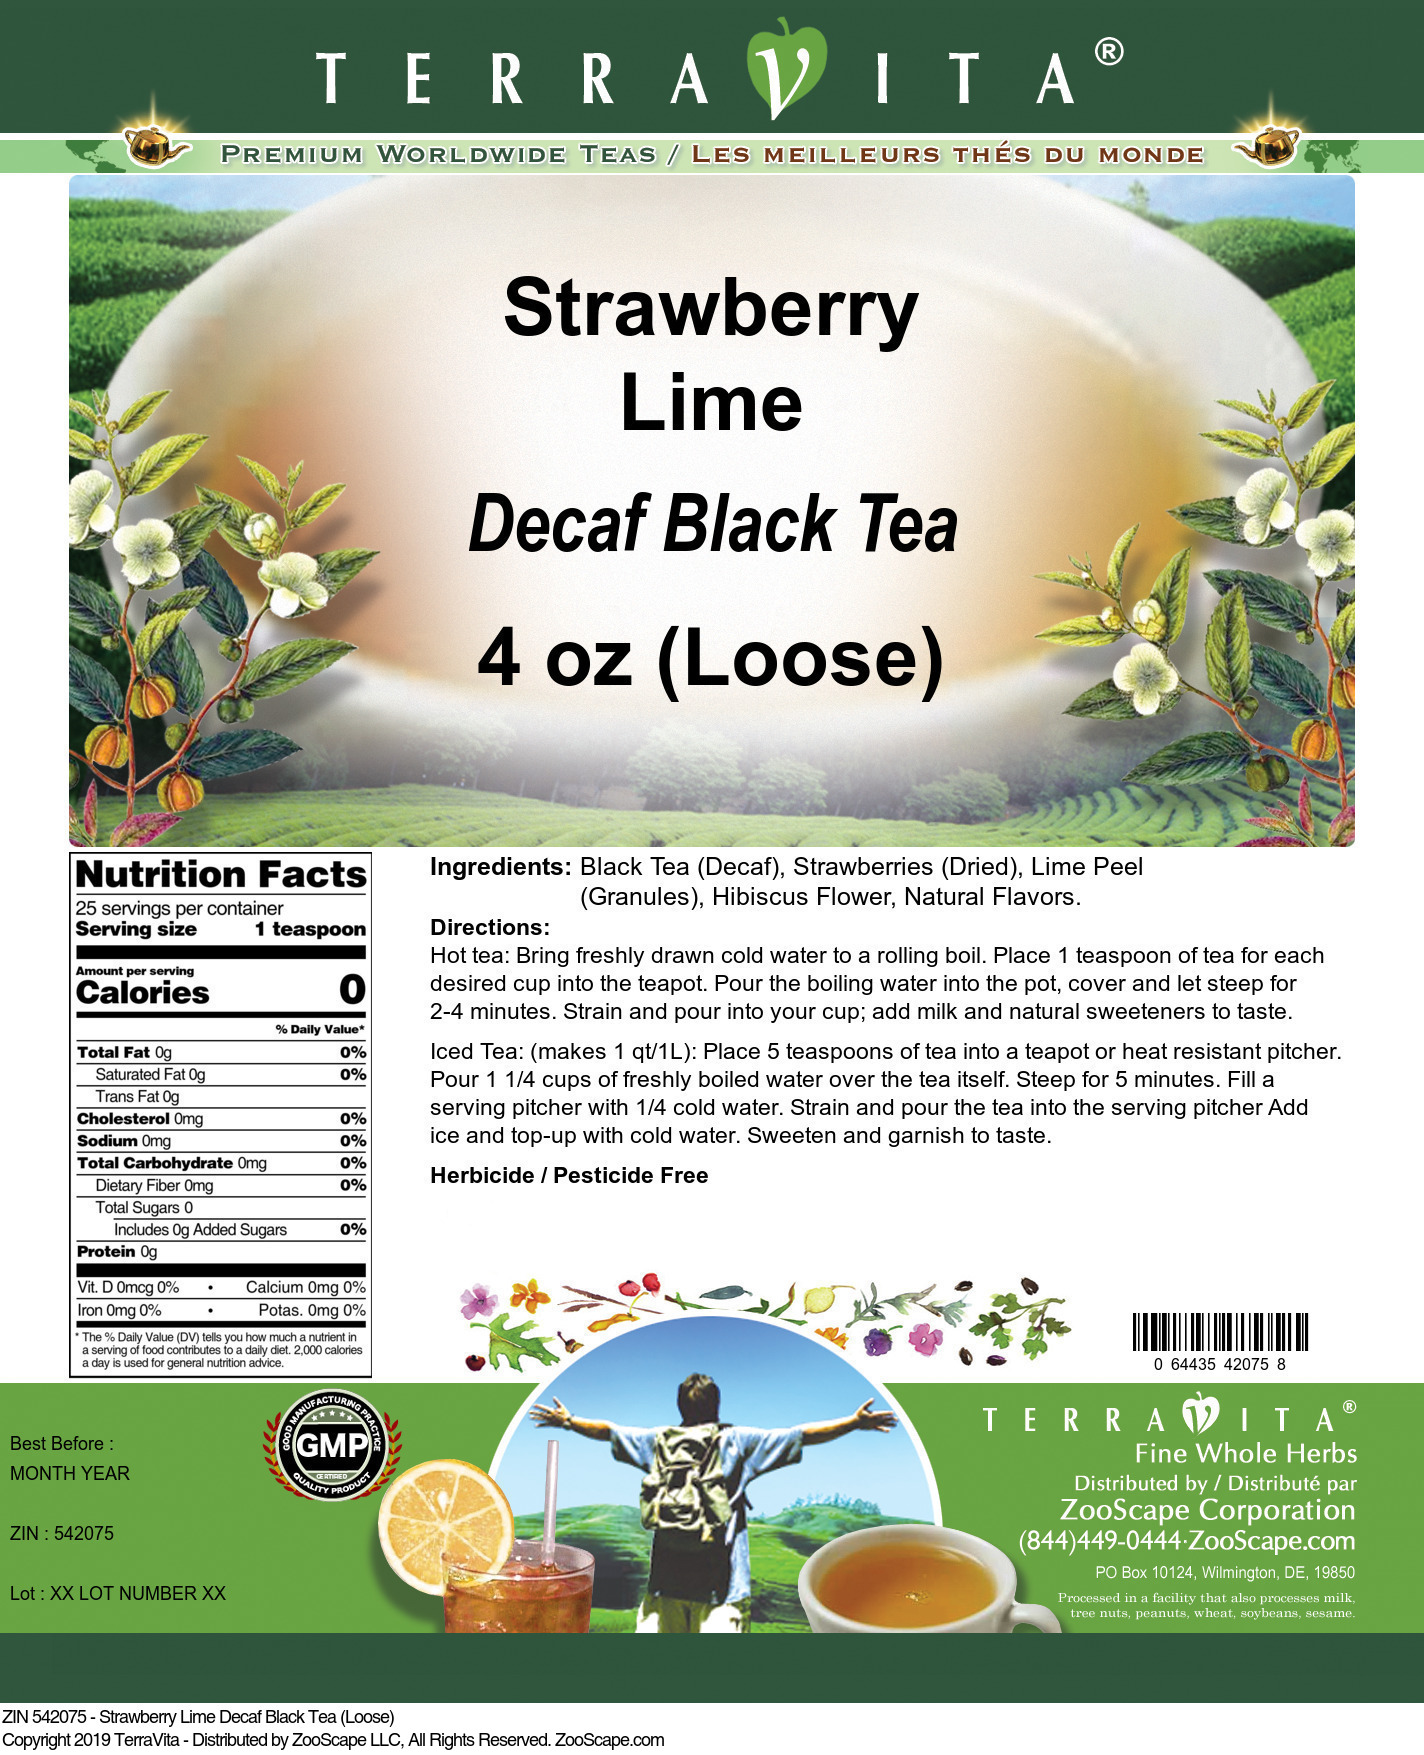 Strawberry Lime Decaf Black Tea (Loose)